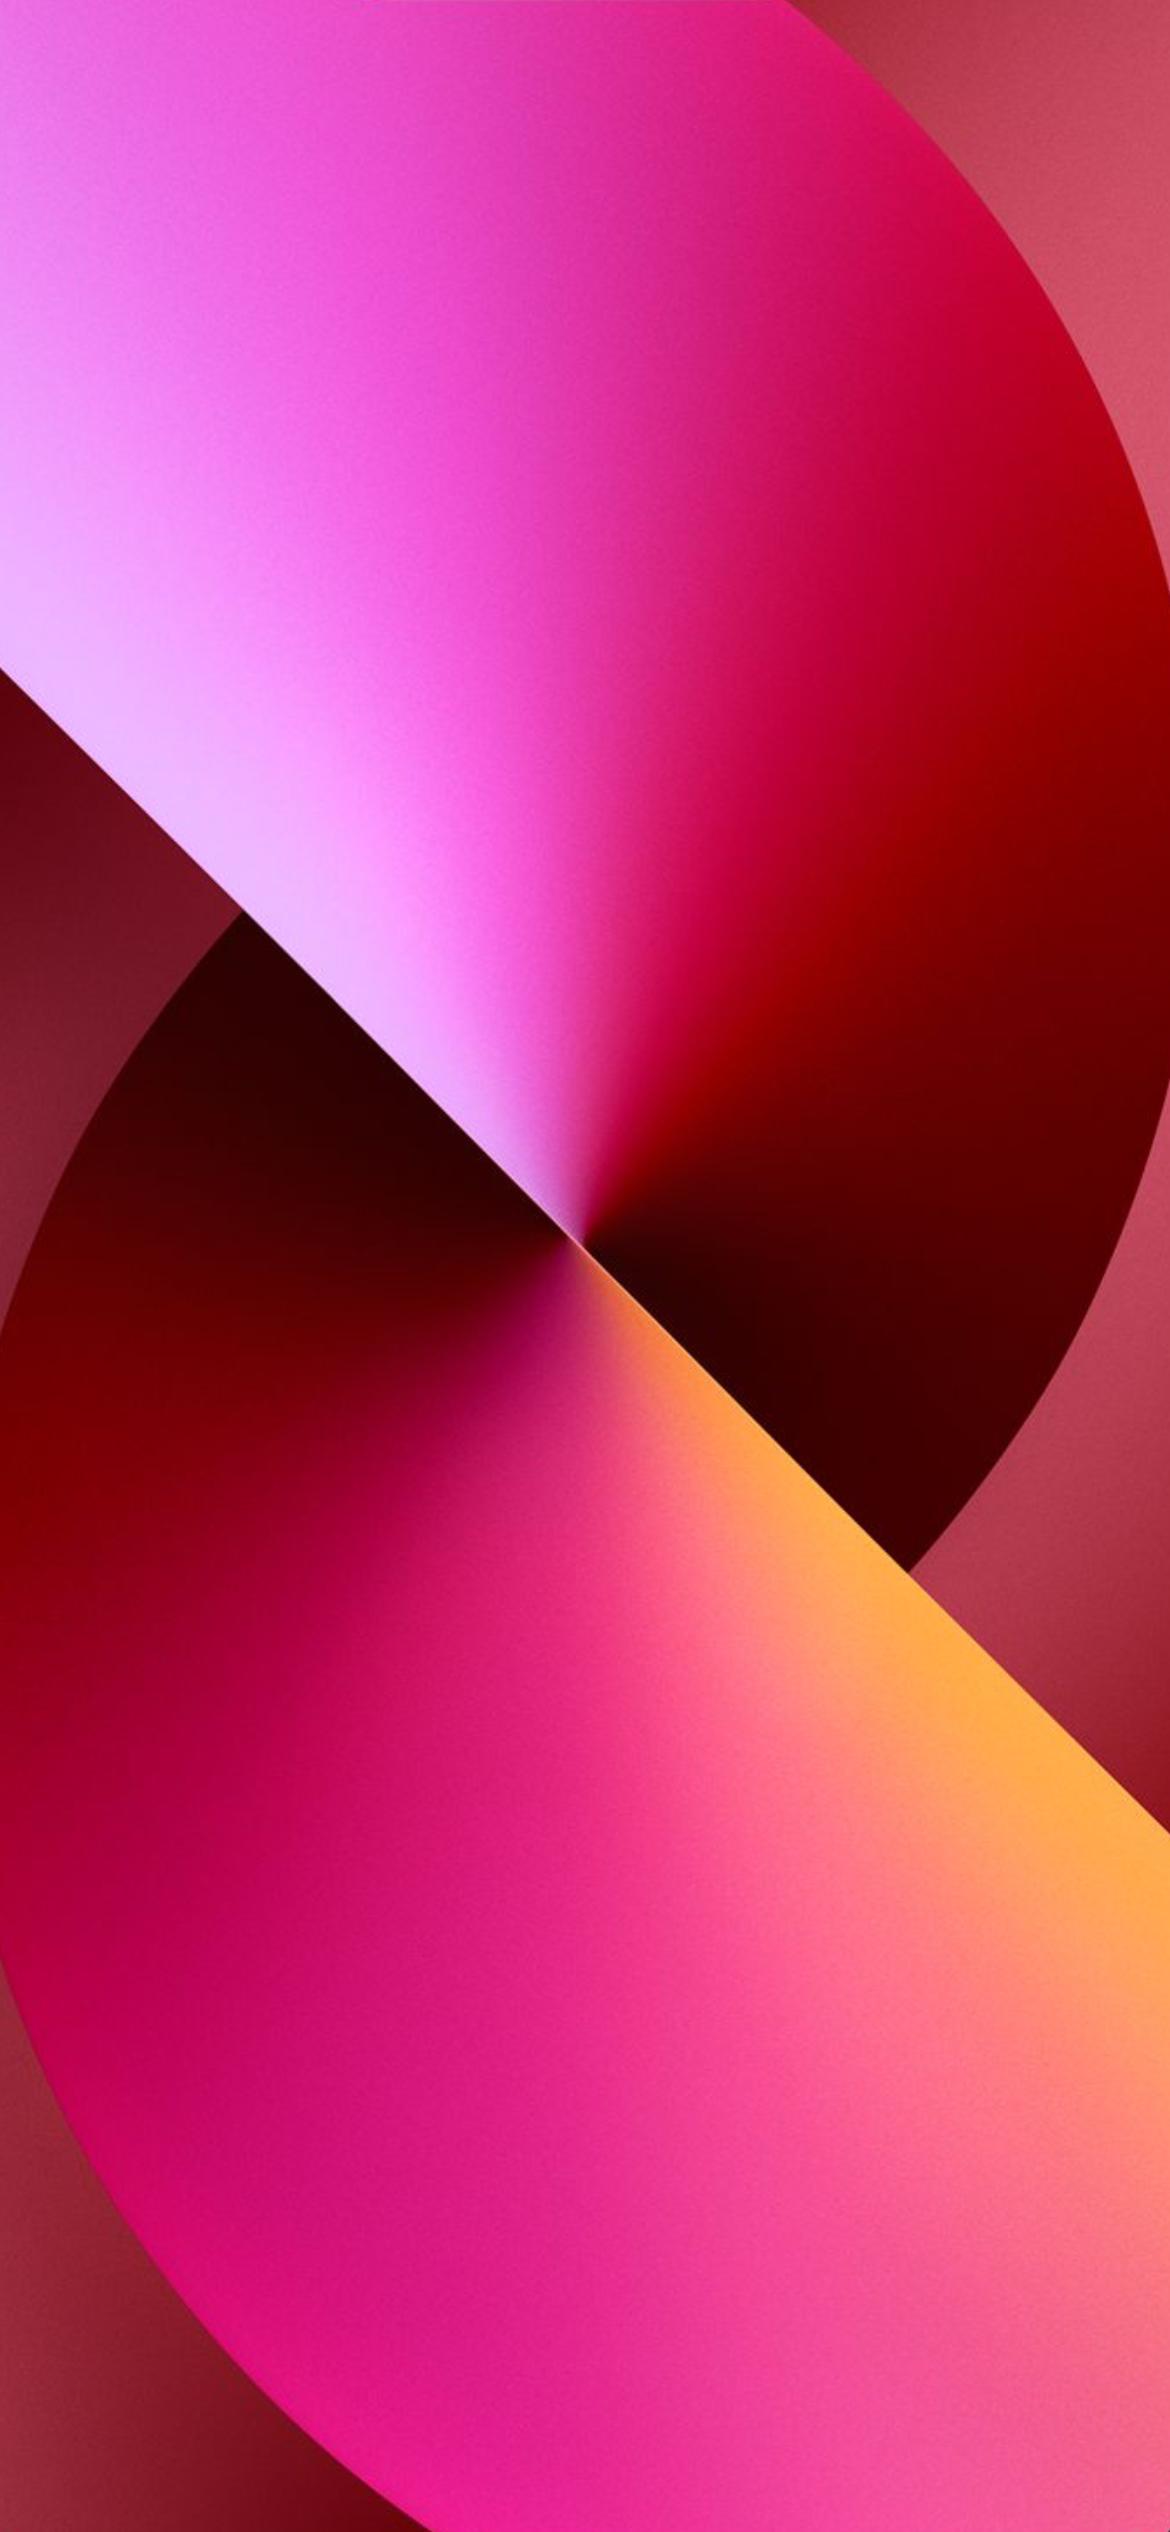 iPhone 13 wallpaper dark pink